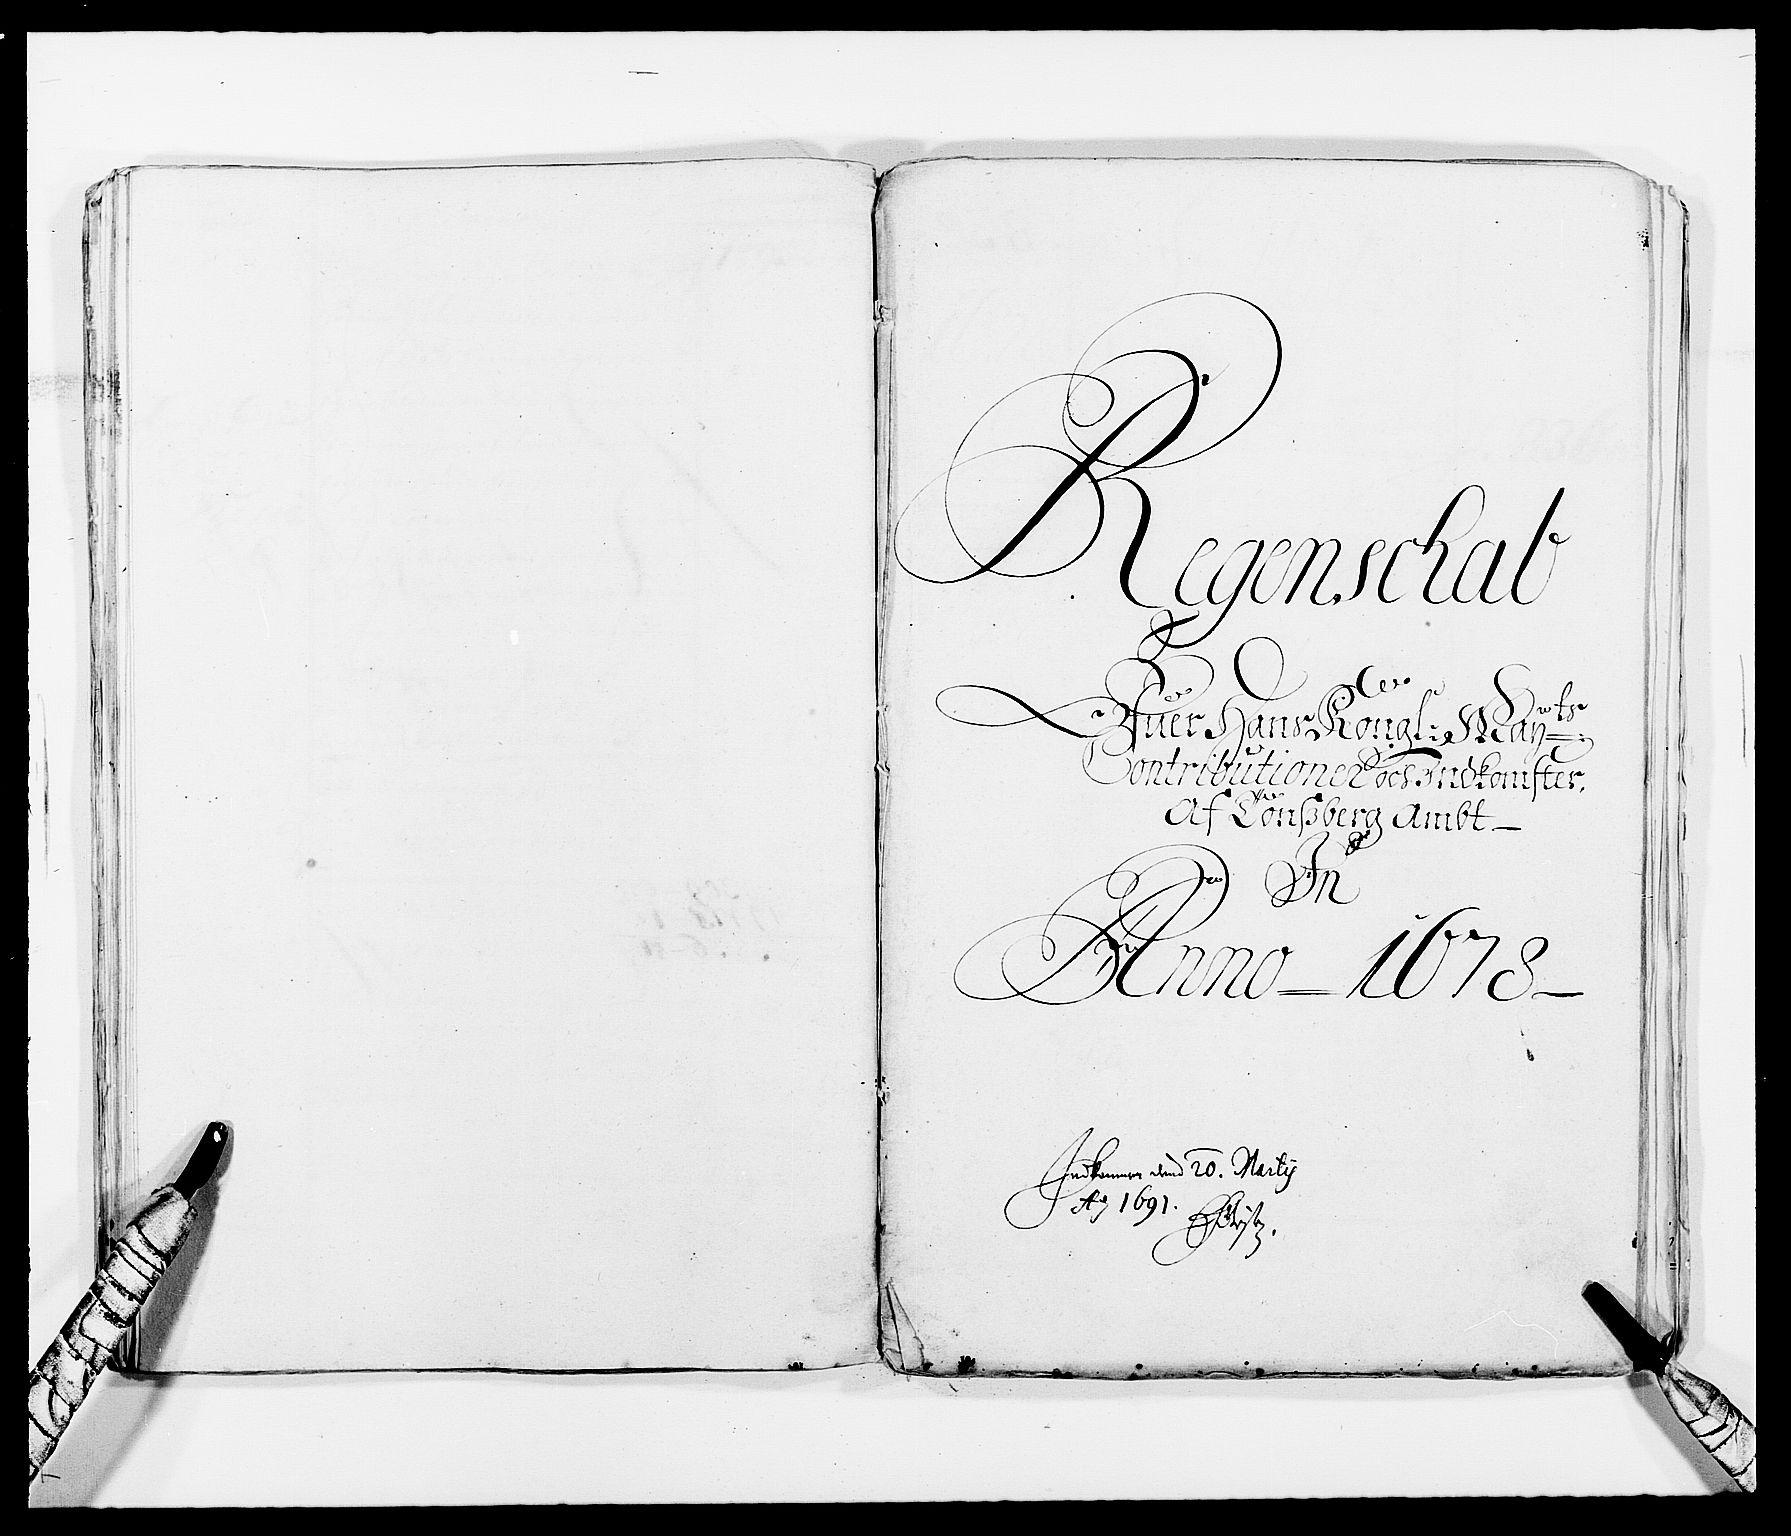 RA, Rentekammeret inntil 1814, Reviderte regnskaper, Fogderegnskap, R32/L1845: Fogderegnskap Jarlsberg grevskap, 1676-1678, s. 36